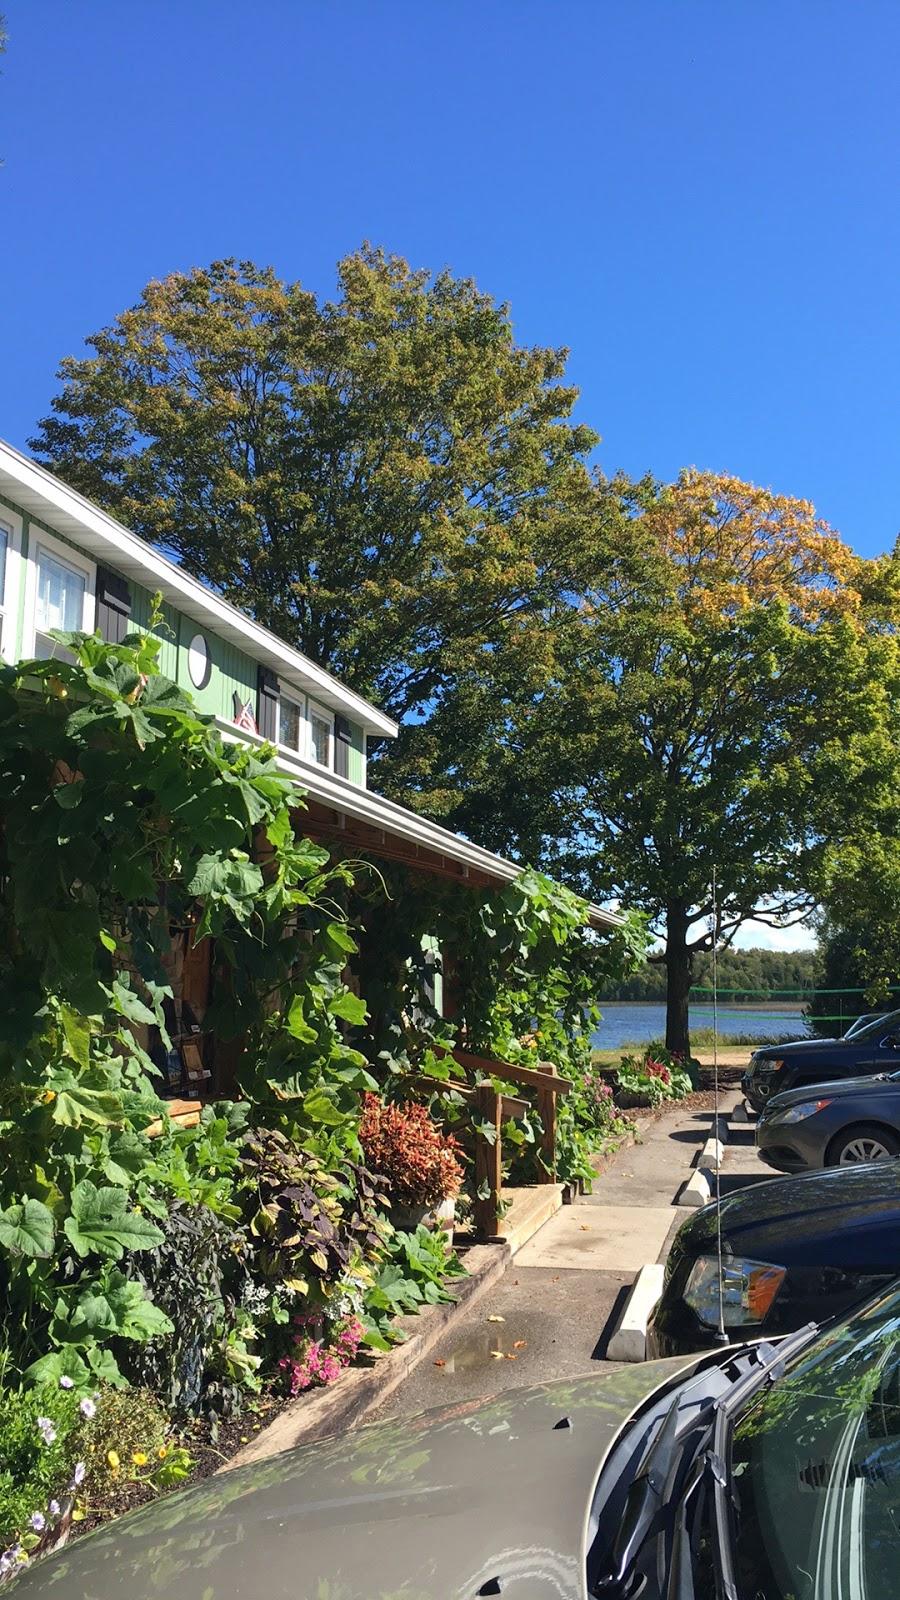 baileys harbor latin singles 1420 pine drive, baileys harbor, wi 54202 midscale, smoke-free, lakefront motel, rated very high, $$.